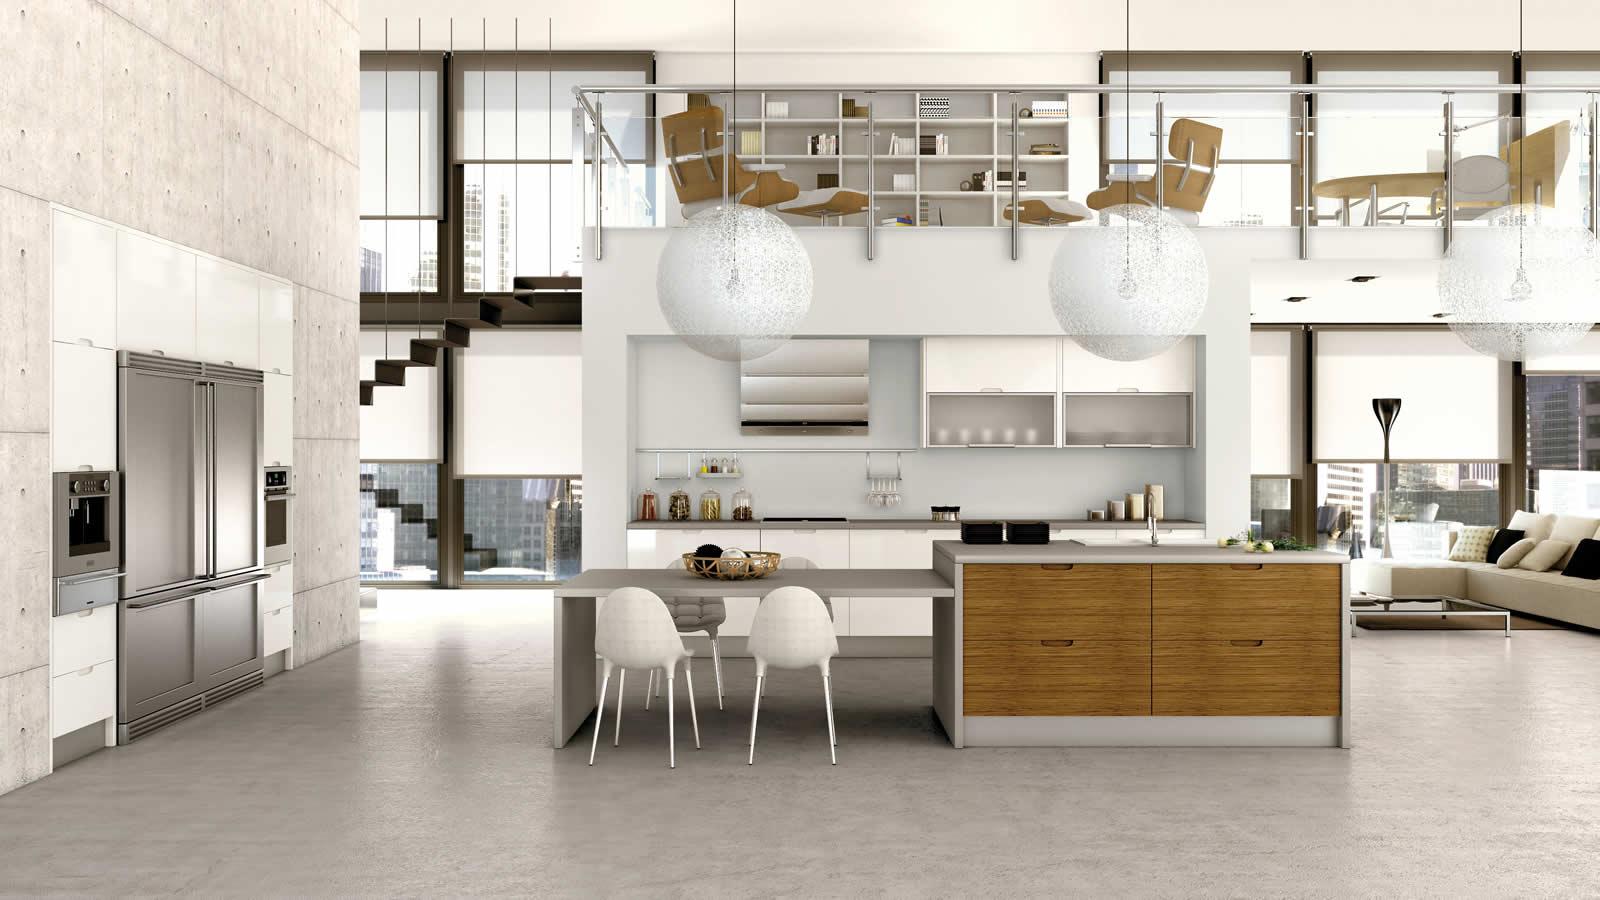 Moderna Cocina Minimalista